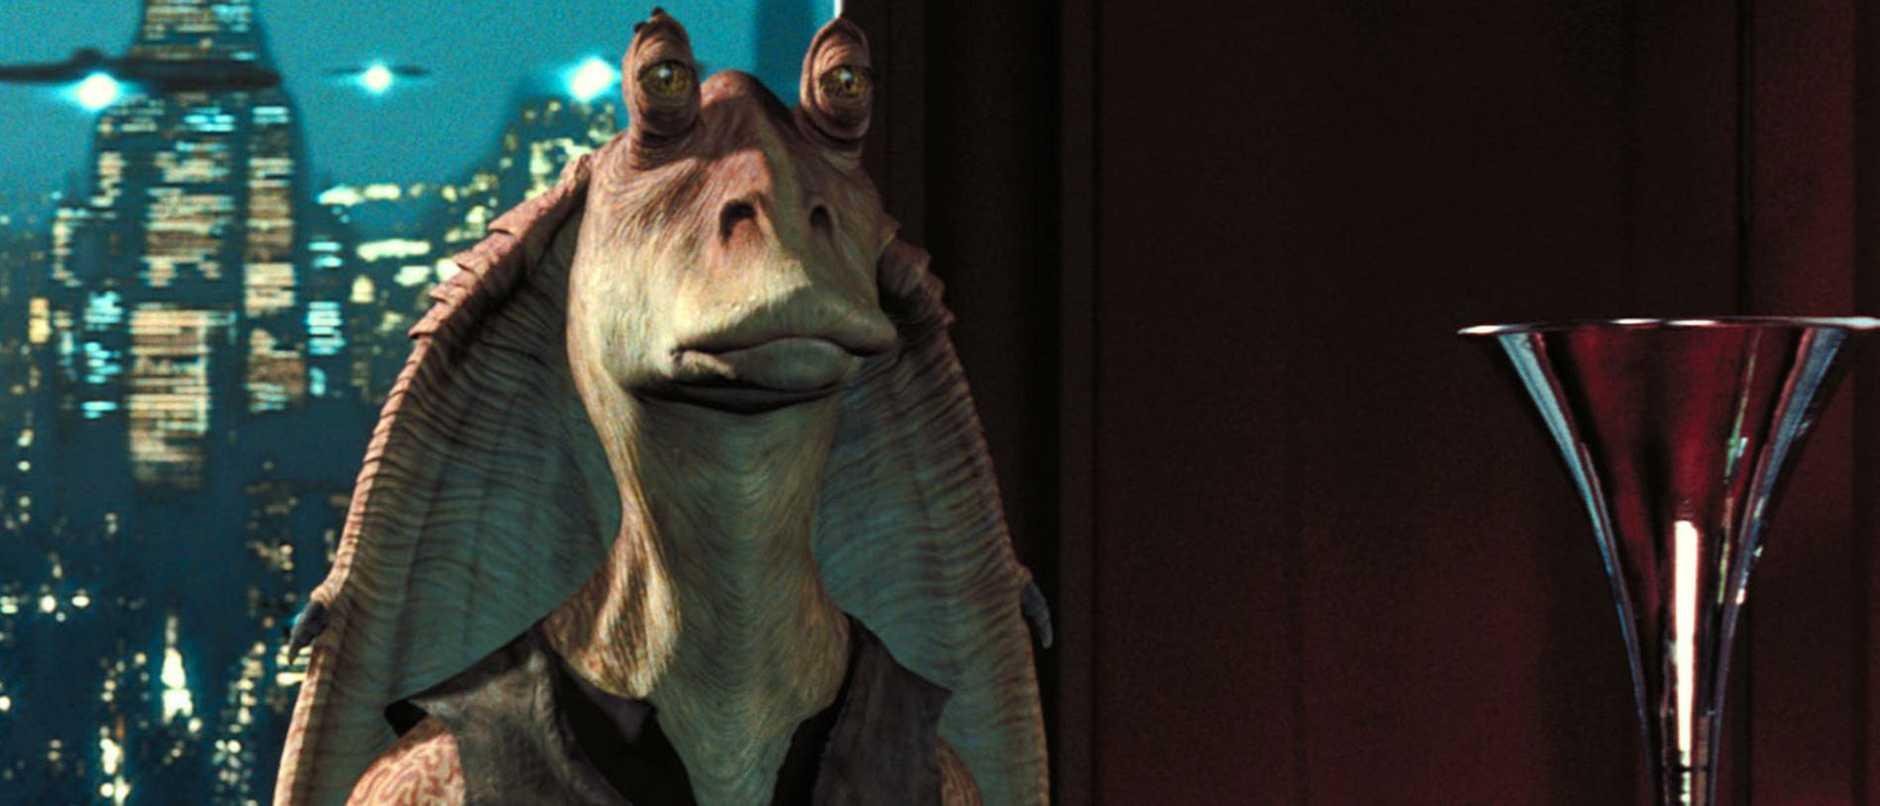 Jar Jar Binks character in scene from Star Wars film